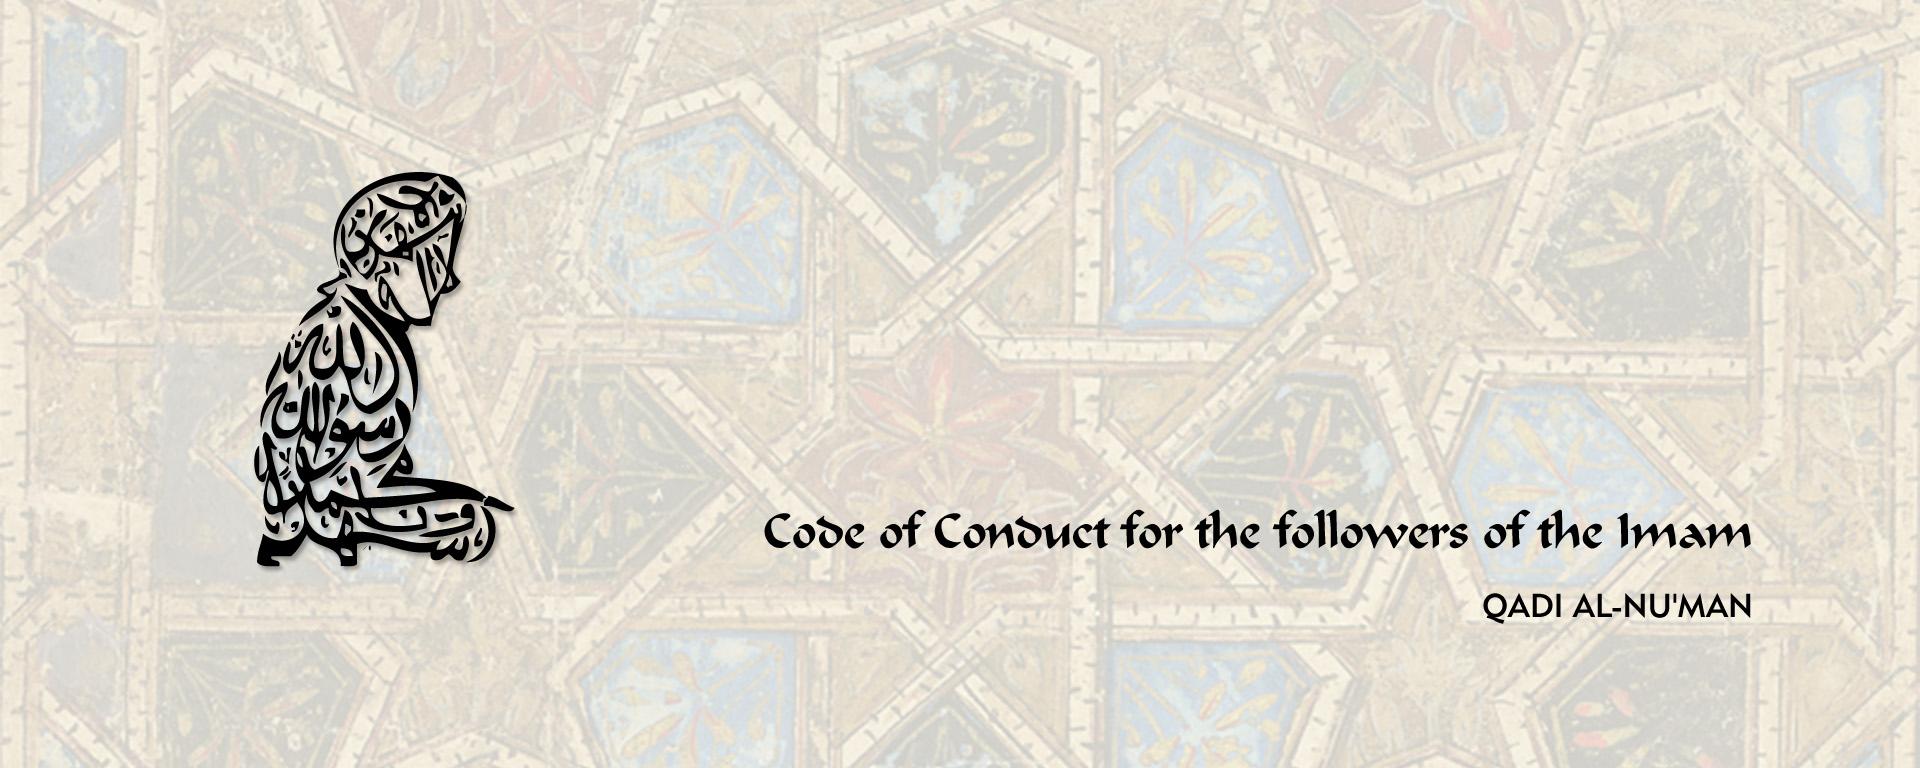 Image: Calligraphy, amaana.org (Bill C-11, Section 29.21 http://bit.ly/1yRu6UZ); Image: Background geometry, Aga Khan Museum (Permitted use) (Bill C-11, Section 29.21 http://bit.ly/1yRu6UZ)